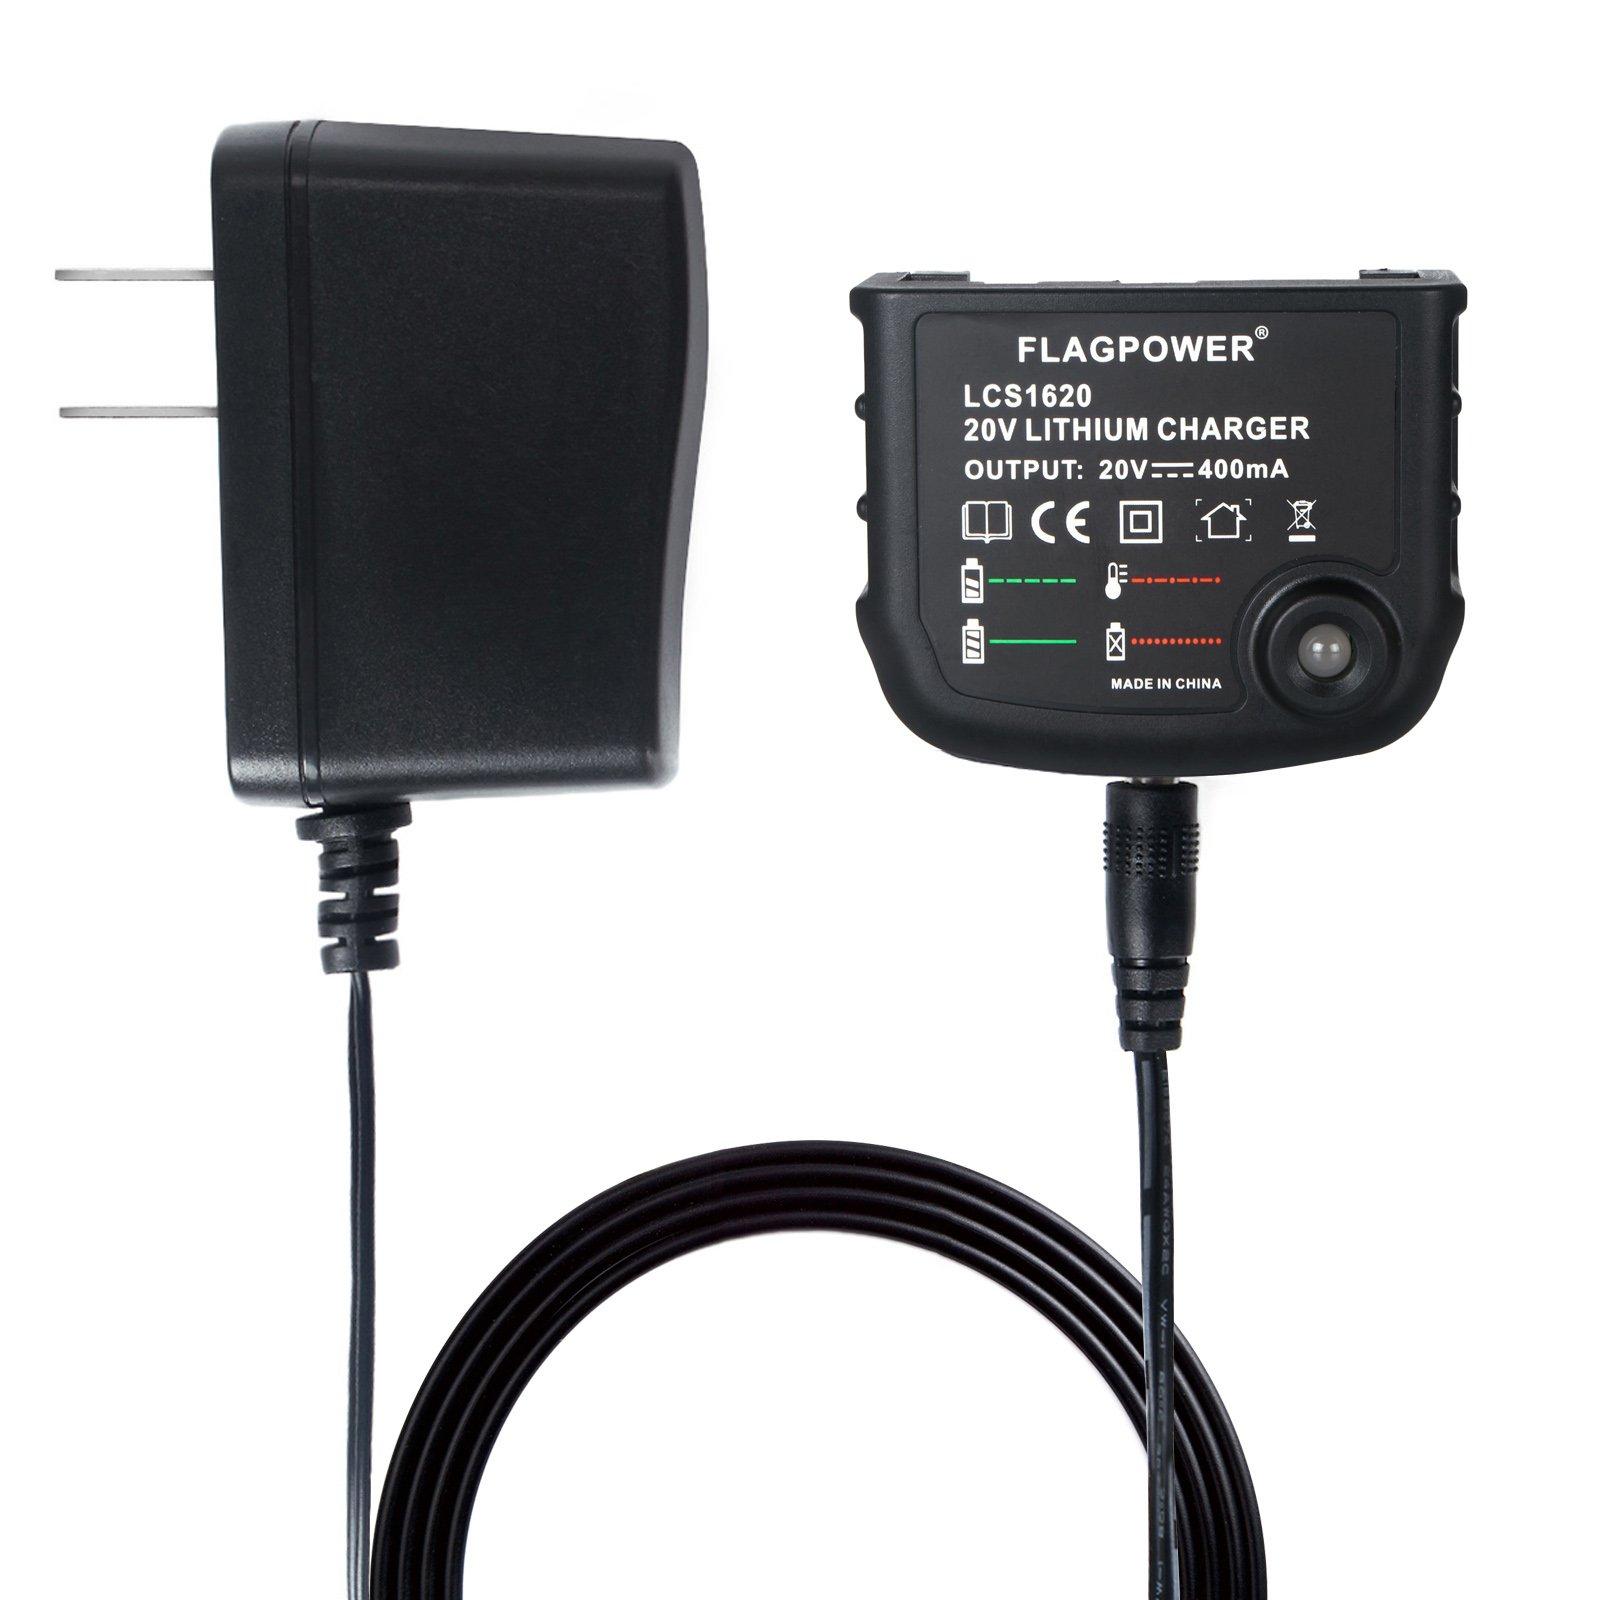 FLAGPOWER 20Volt Li-Ion Battery Charger LCS1620 for Black+Decker 16V 20V Lithium Ion Battery LBXR20 LBXR20-OPE LB20 LBX20 LBX4020 LB2X4020 LBXR2020-OPE BL1514 LBXR16